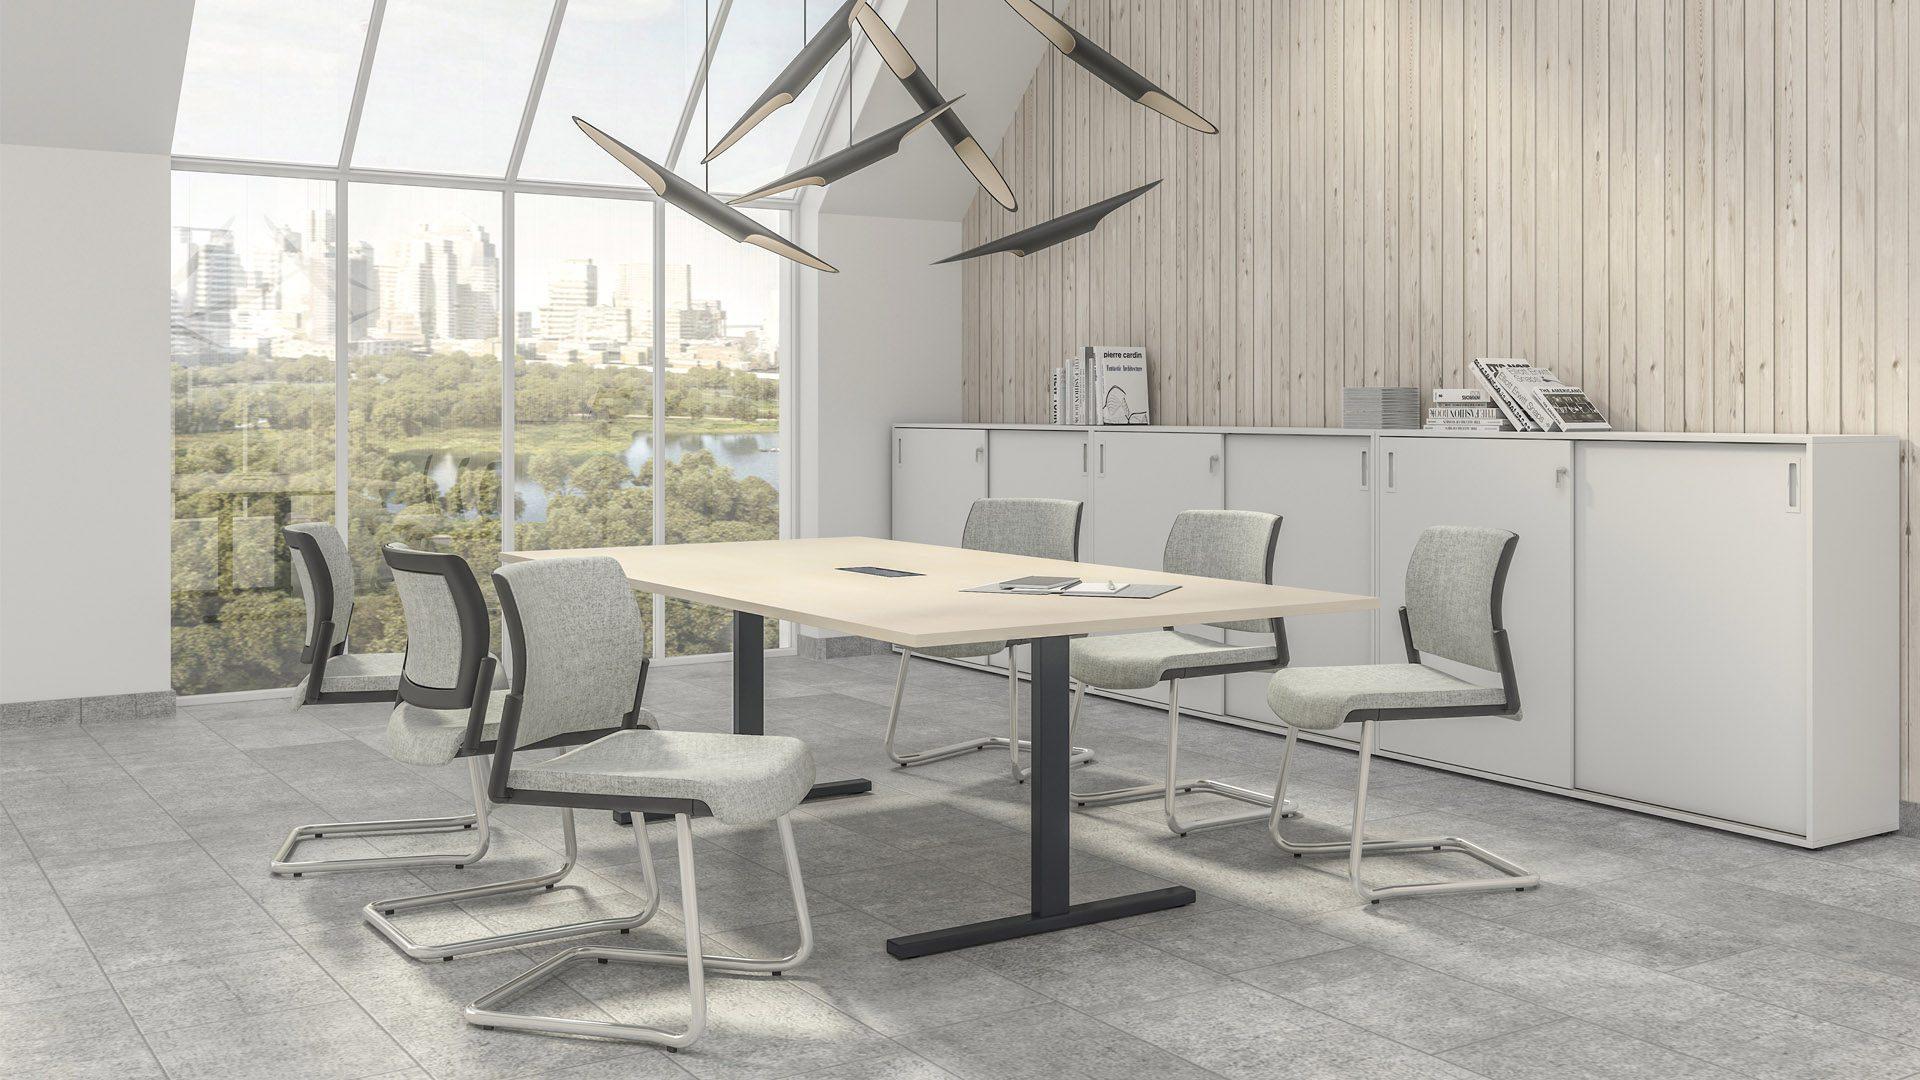 Apspriežu galds T-EASY un konferenču krēsli AURA